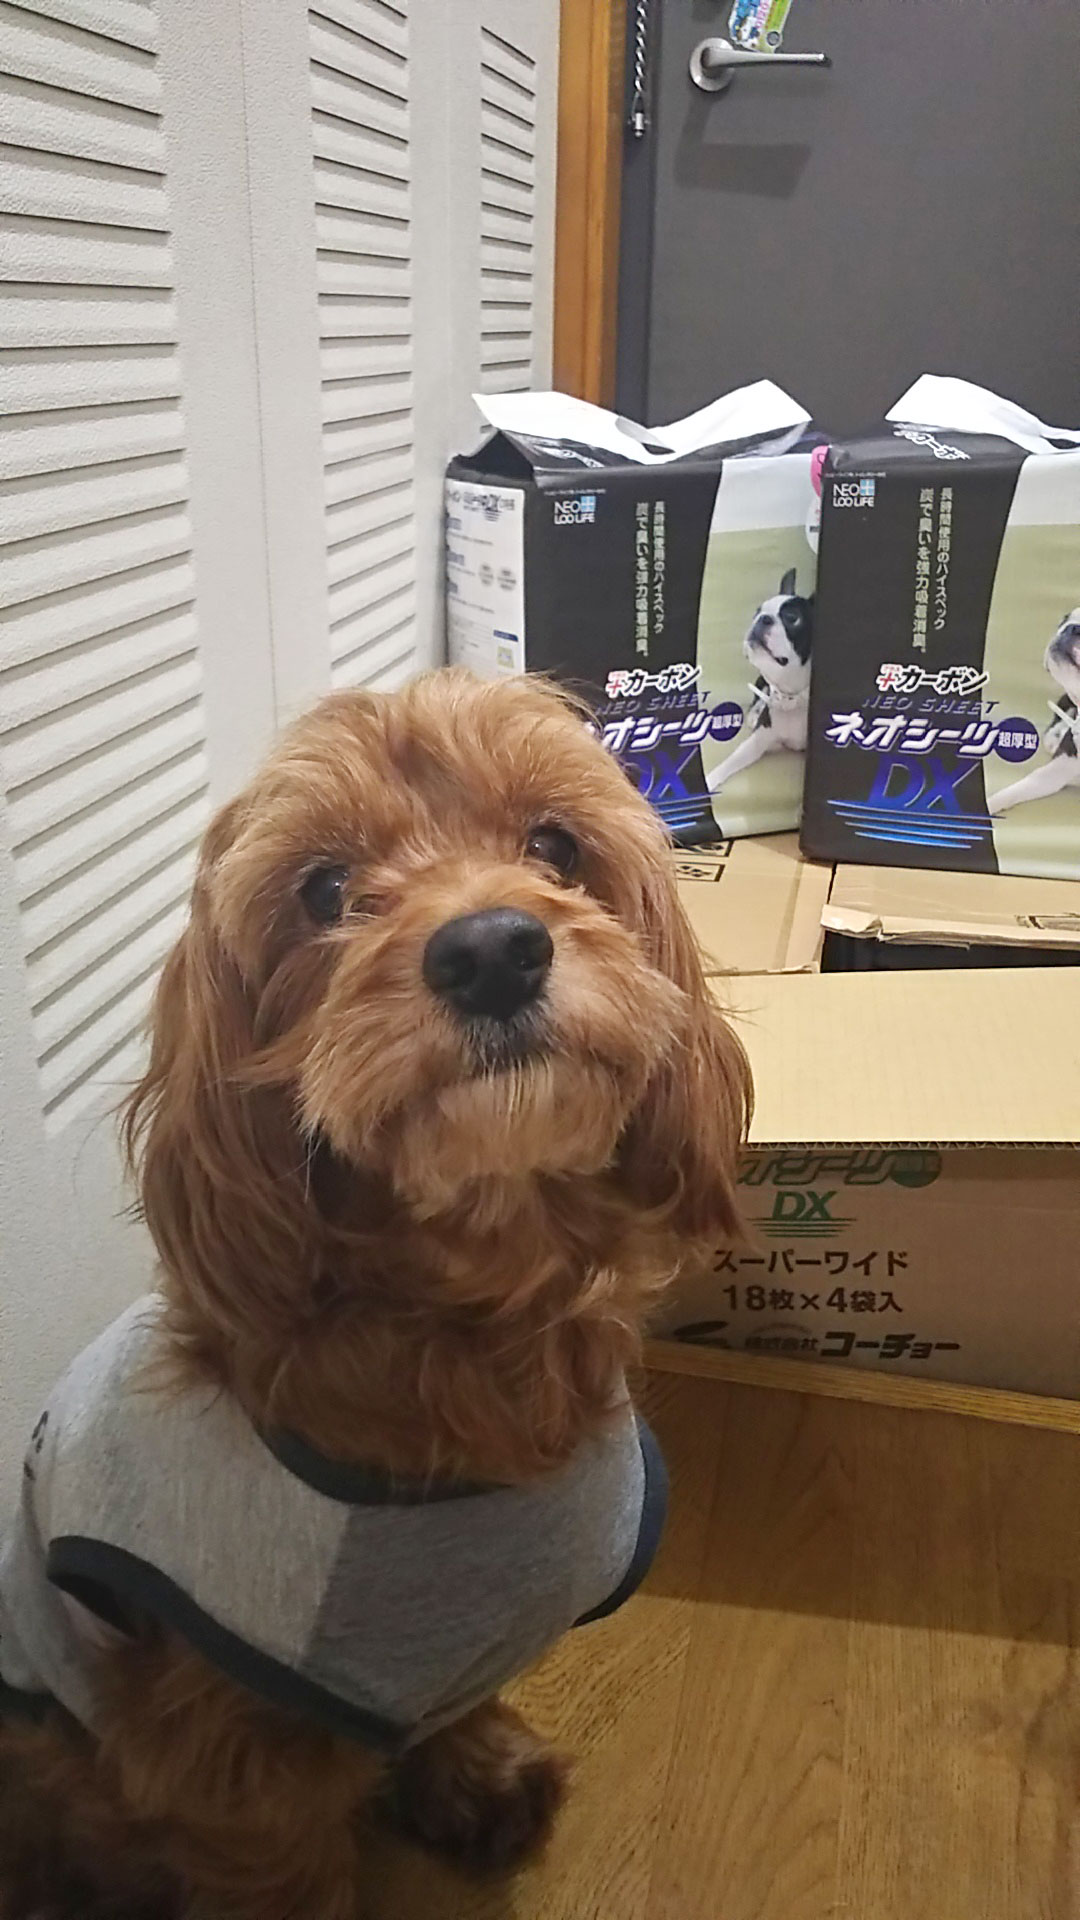 幸せ尻尾3_保護犬.jpg